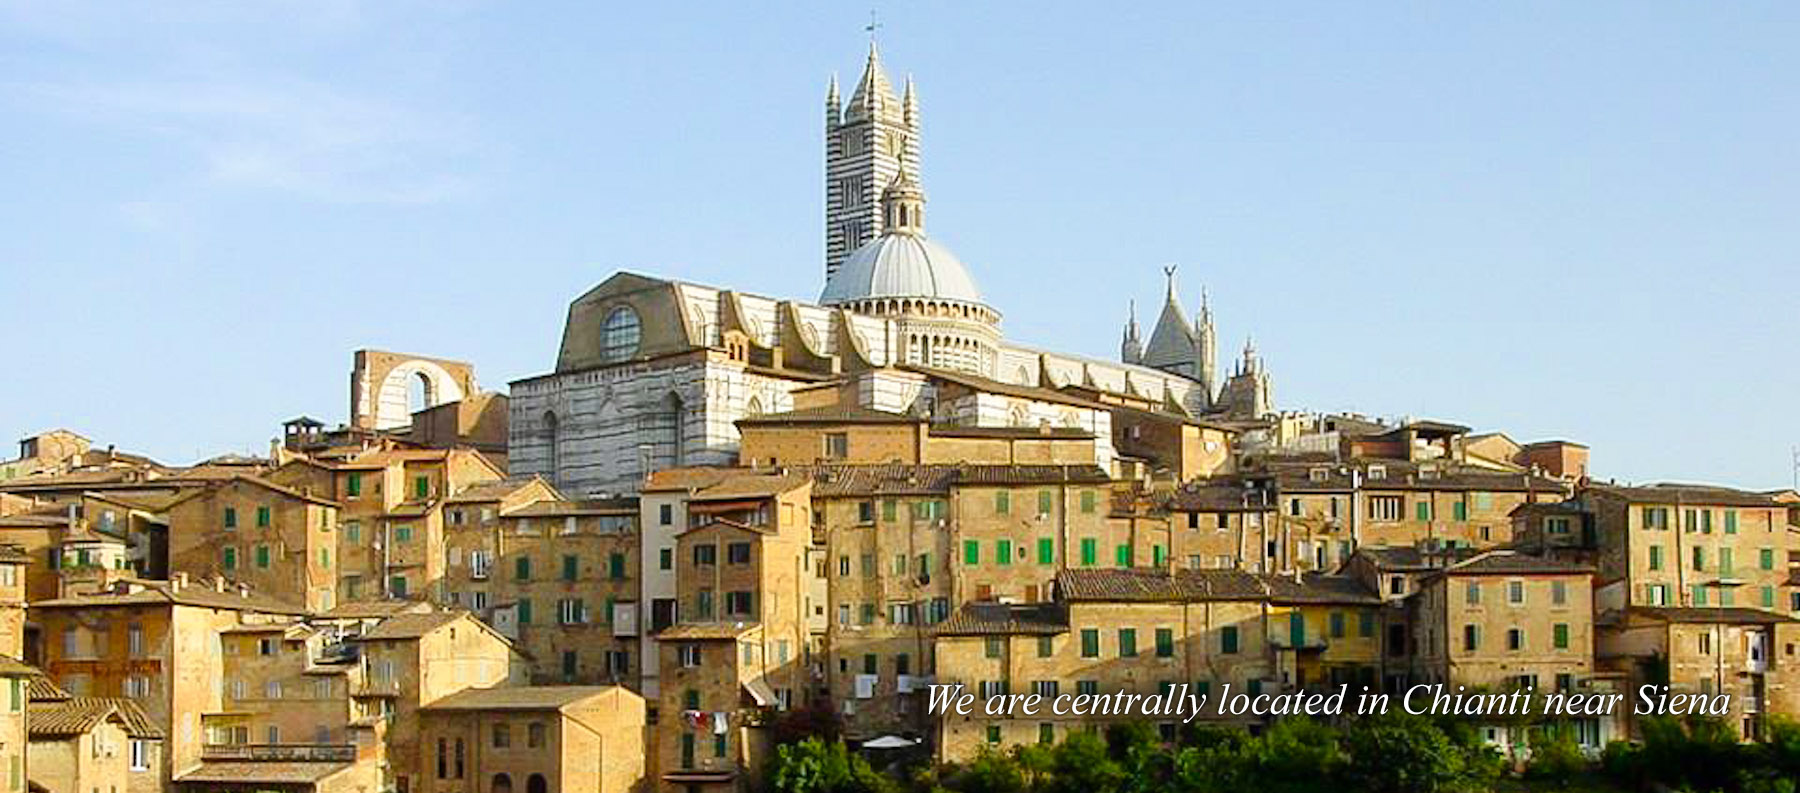 We are centrally located in Chianti near Siena